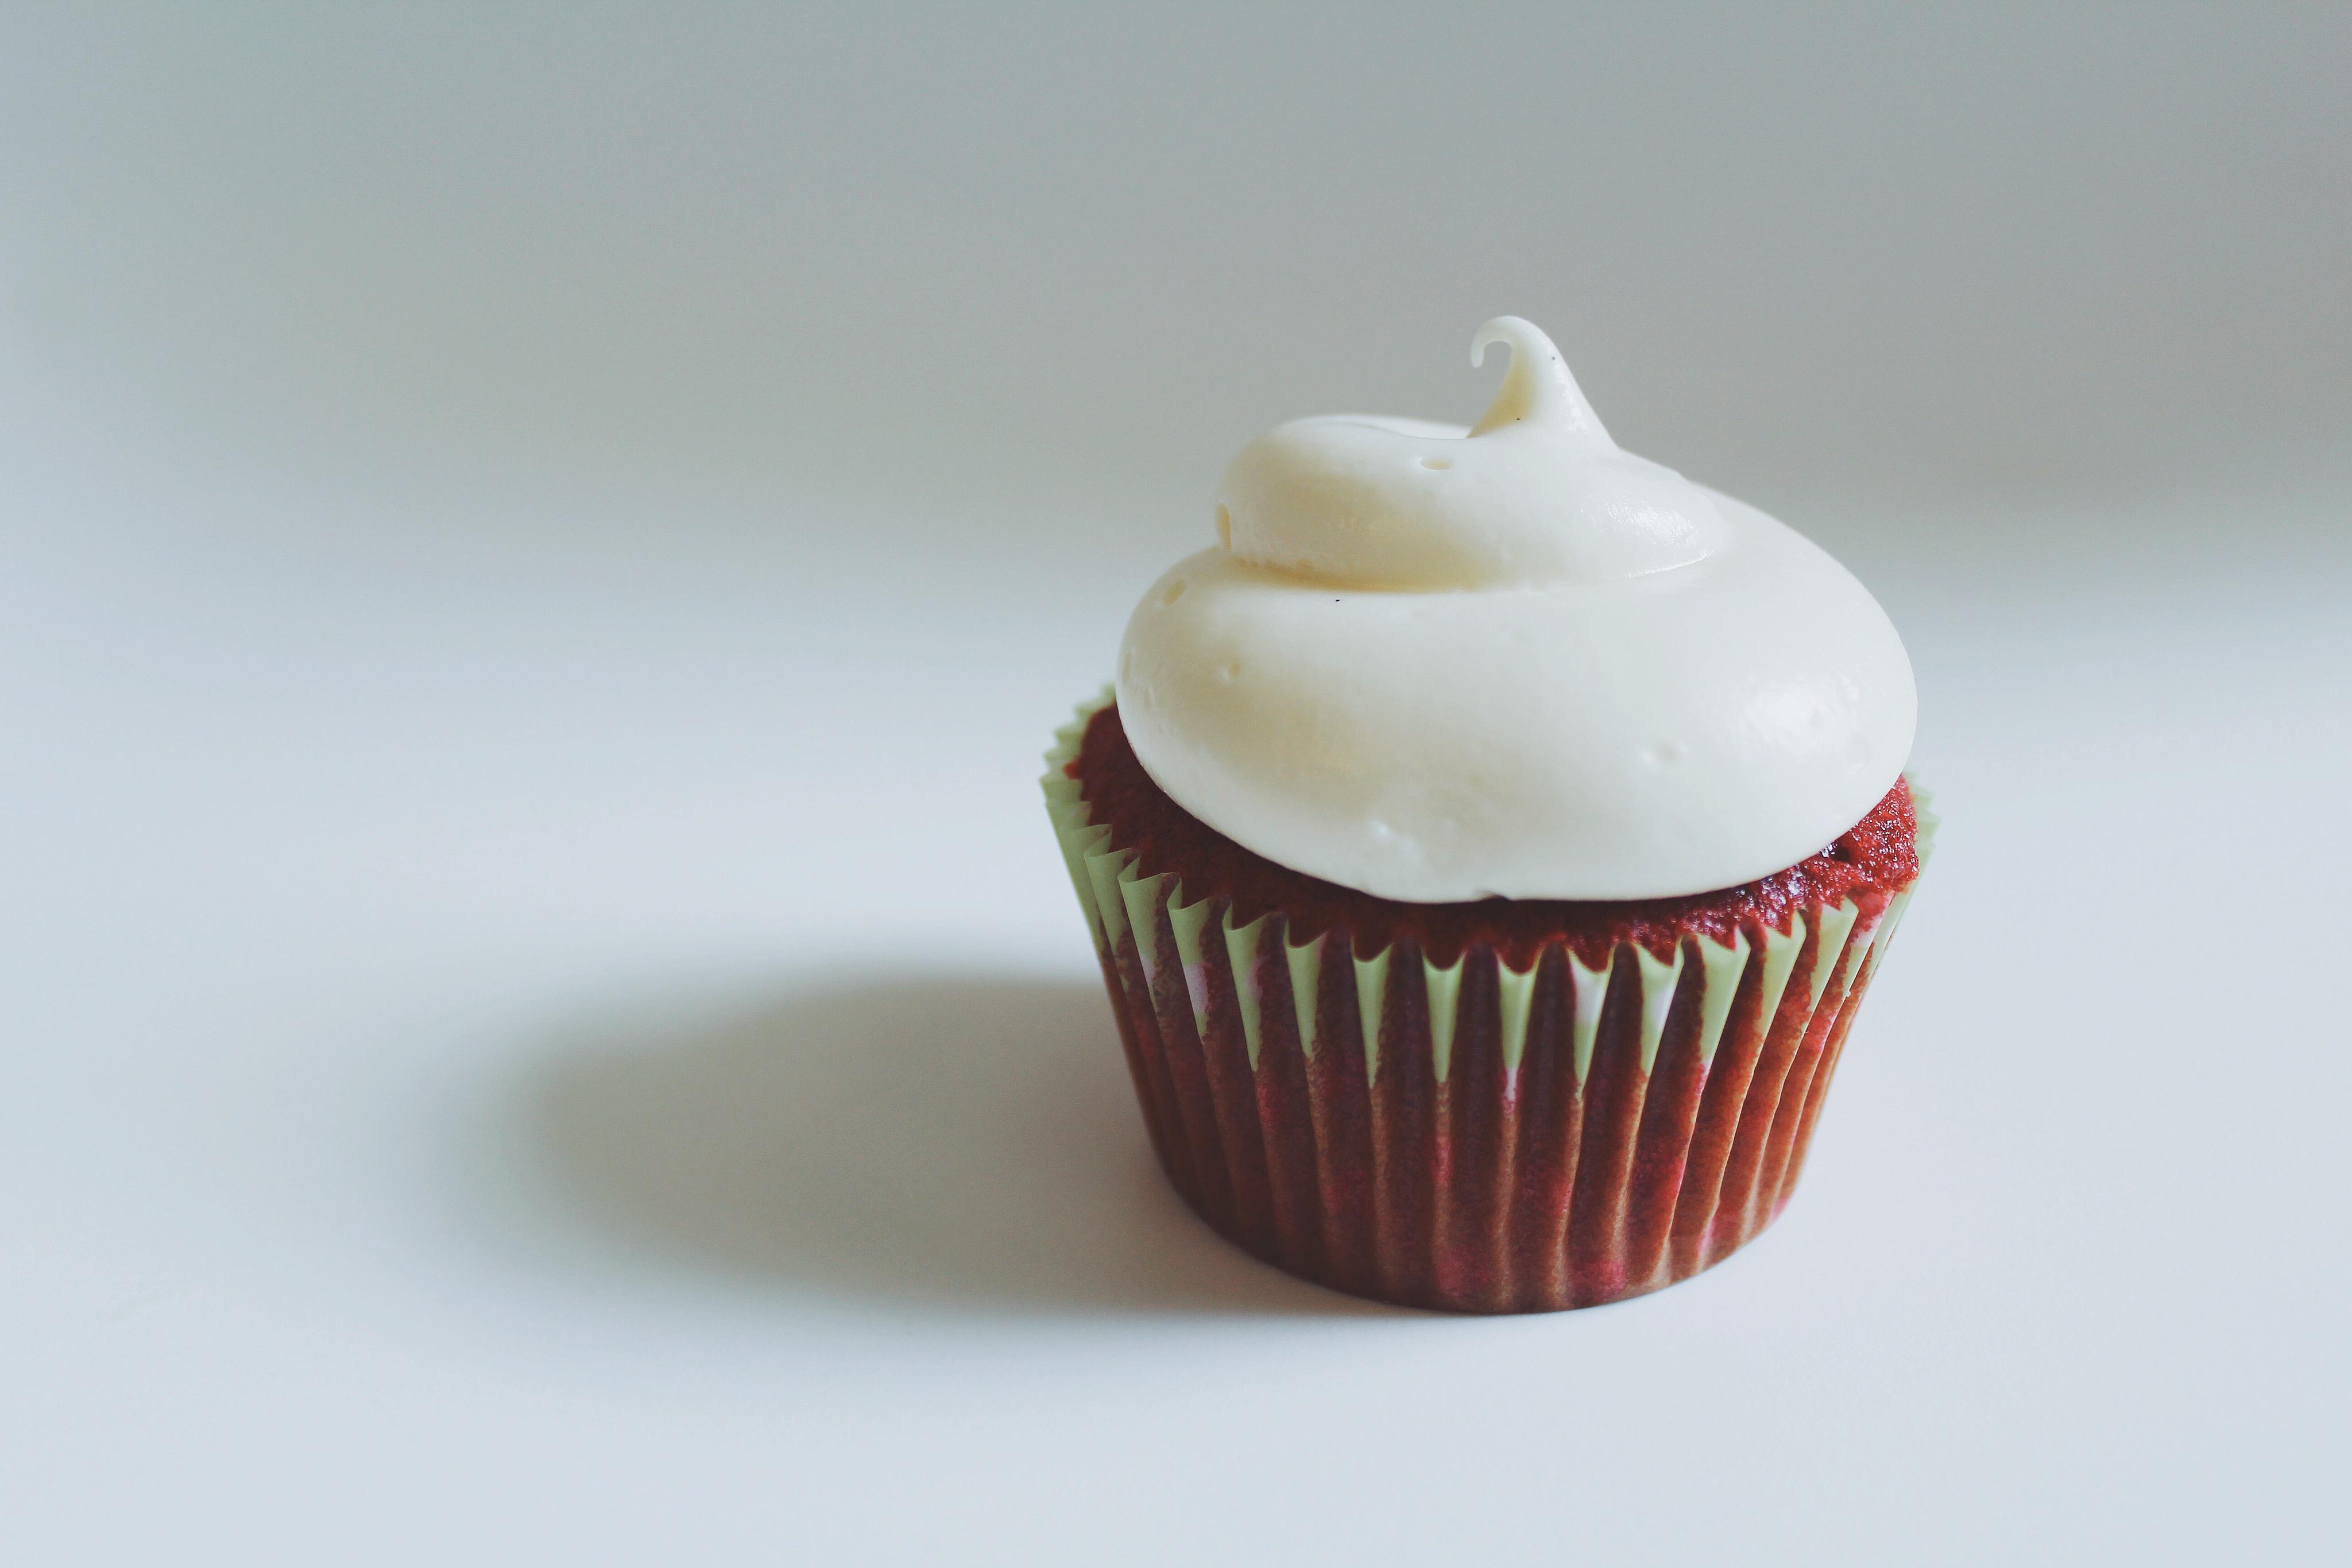 Homemade Georgetown Cupcakes